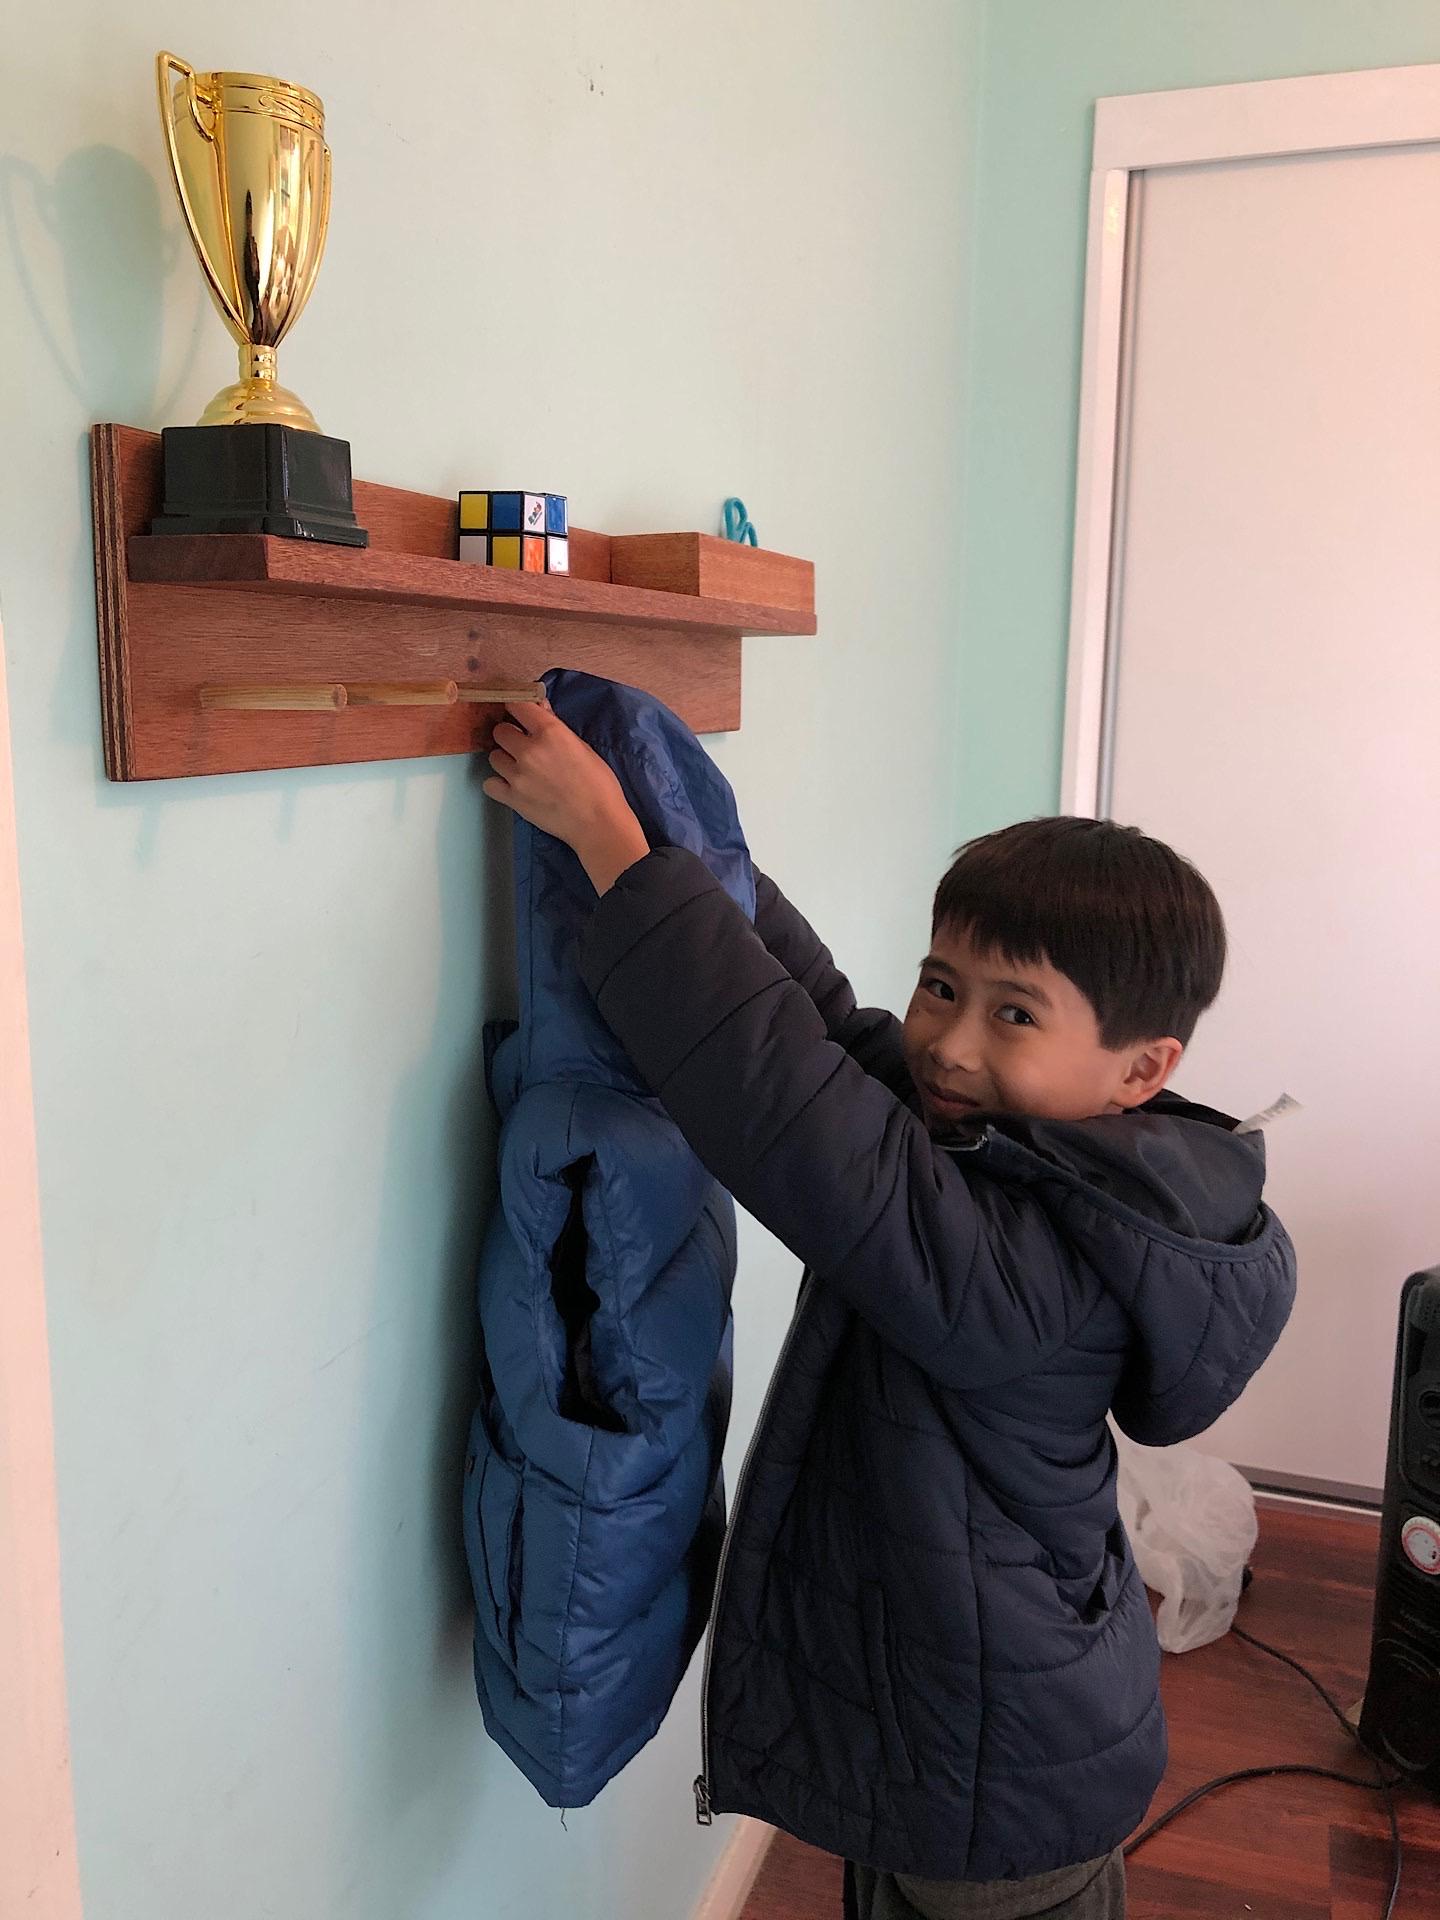 Installing the homemade wall coat hanger